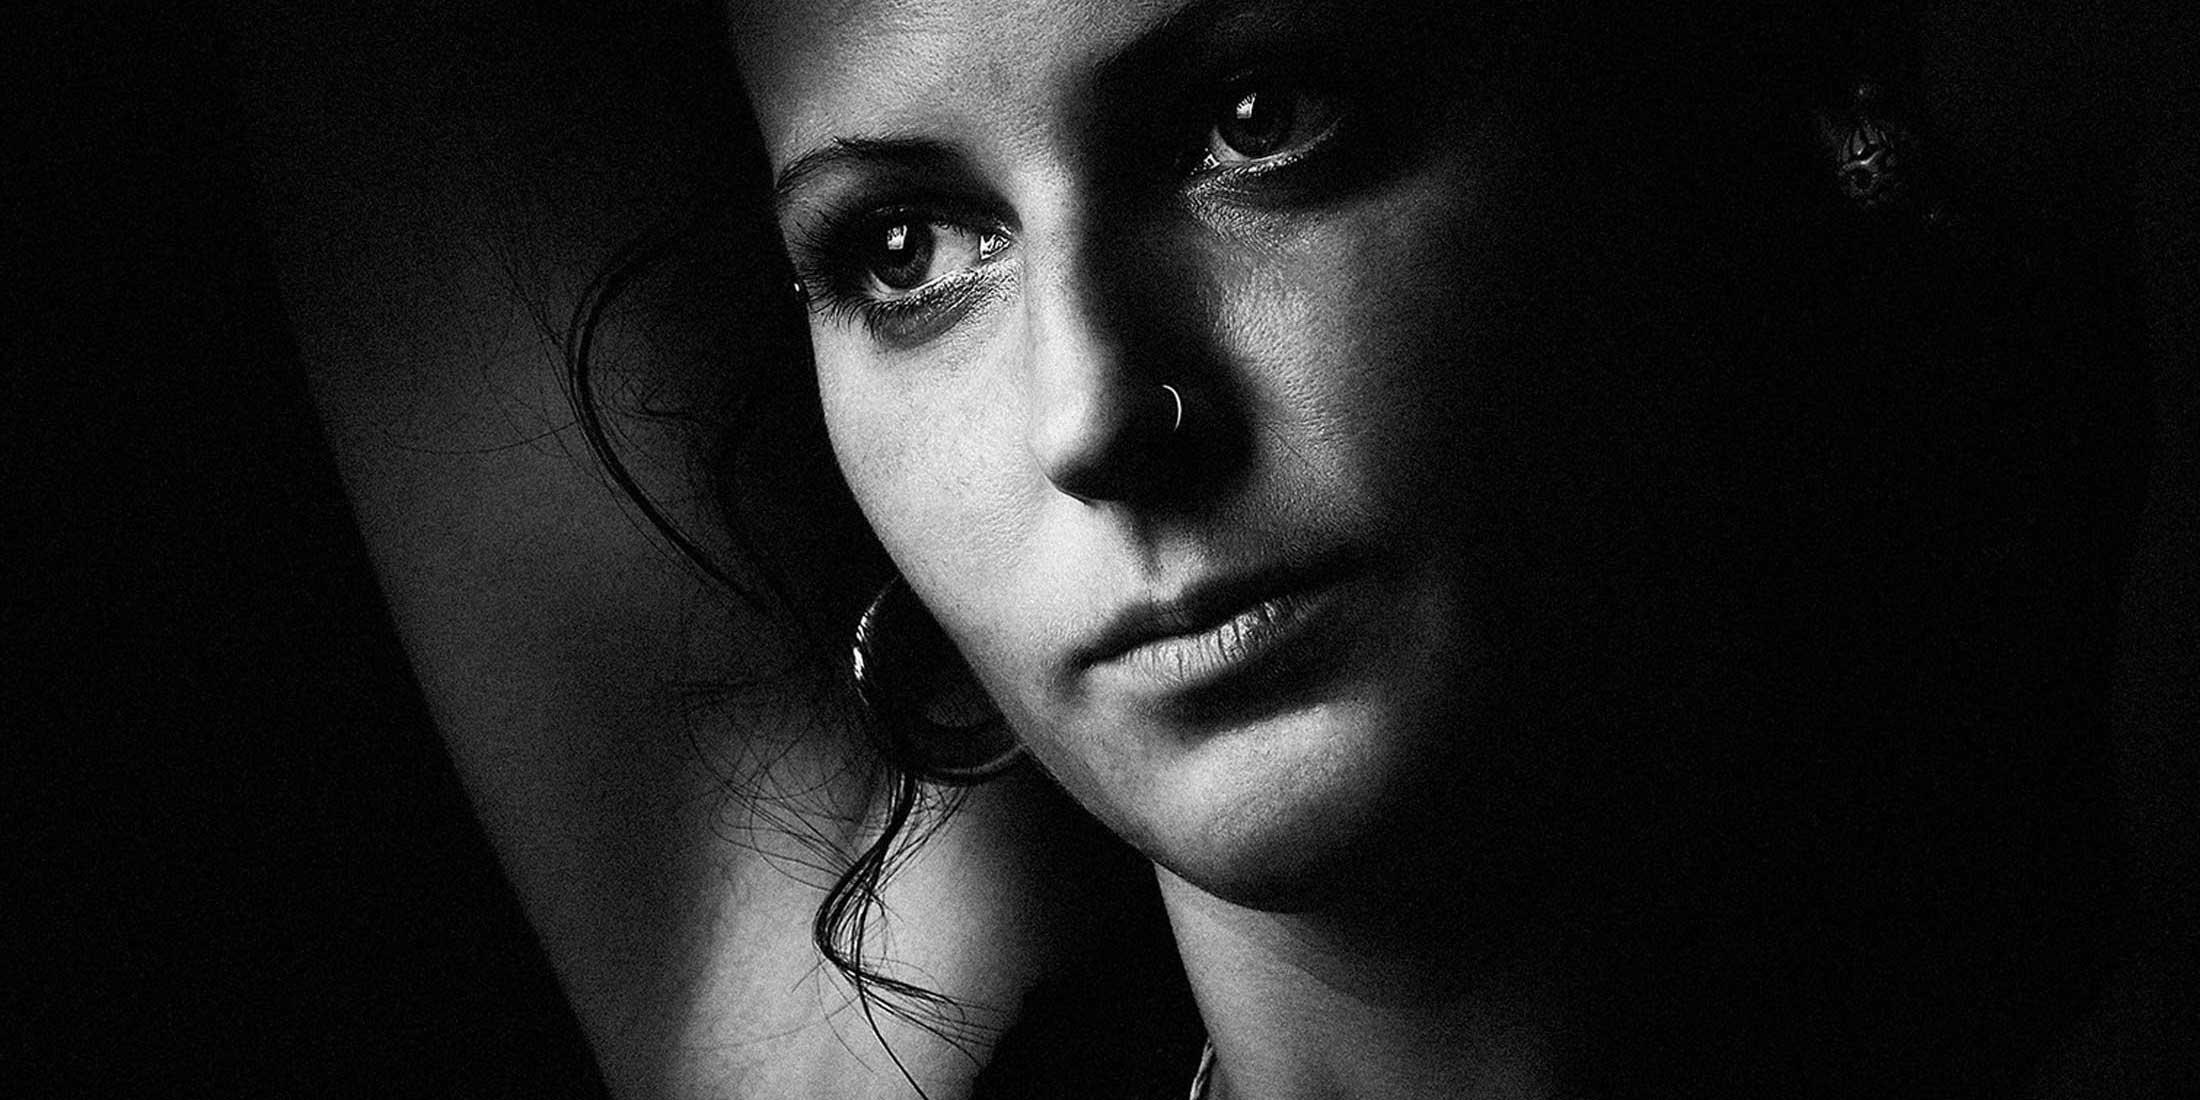 woman_model_eyes_detail_portrait_art